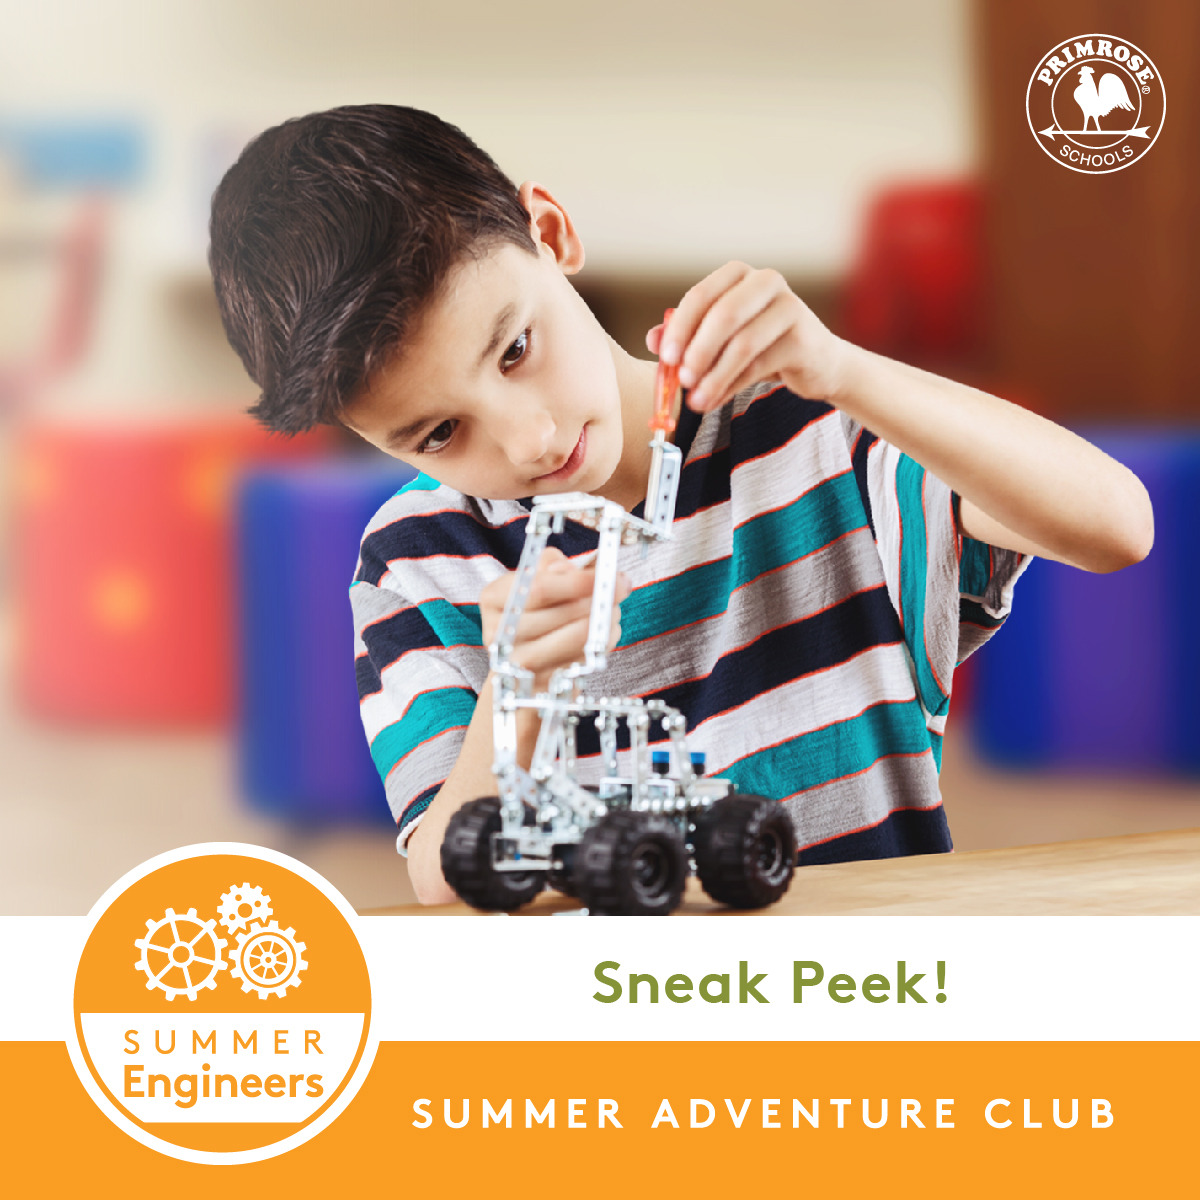 Primrose Summer Camp; Primrose at The Park summer camp, School age summer camp, primrose summer, Morrisville Summer Camp